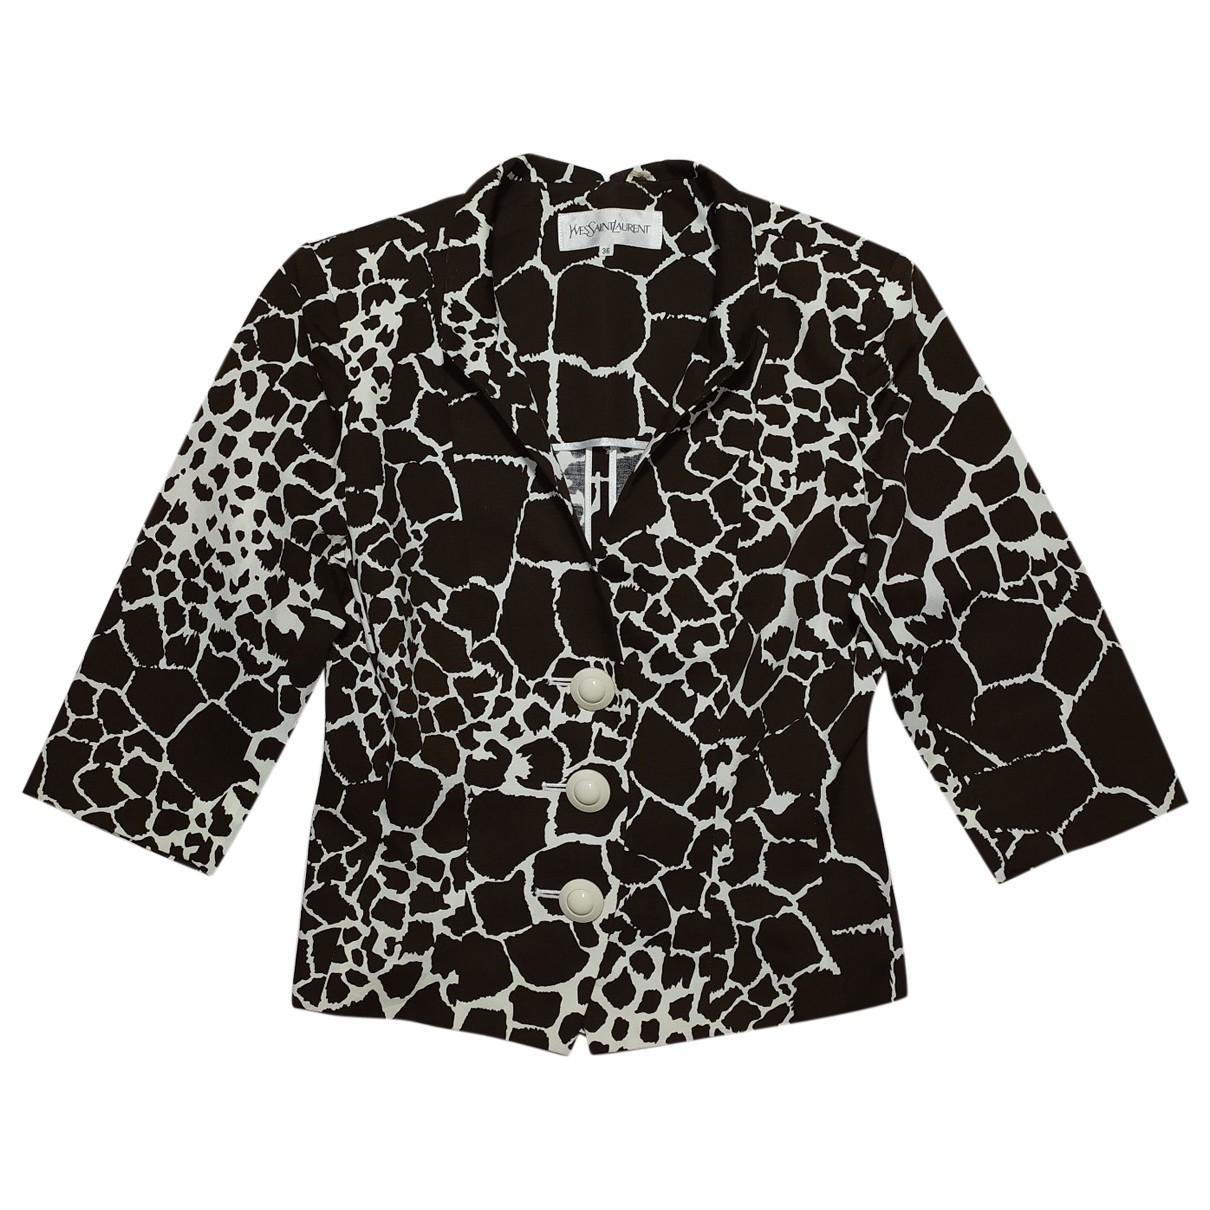 Yves Saint Laurent \N Brown Cotton  top for Women S International